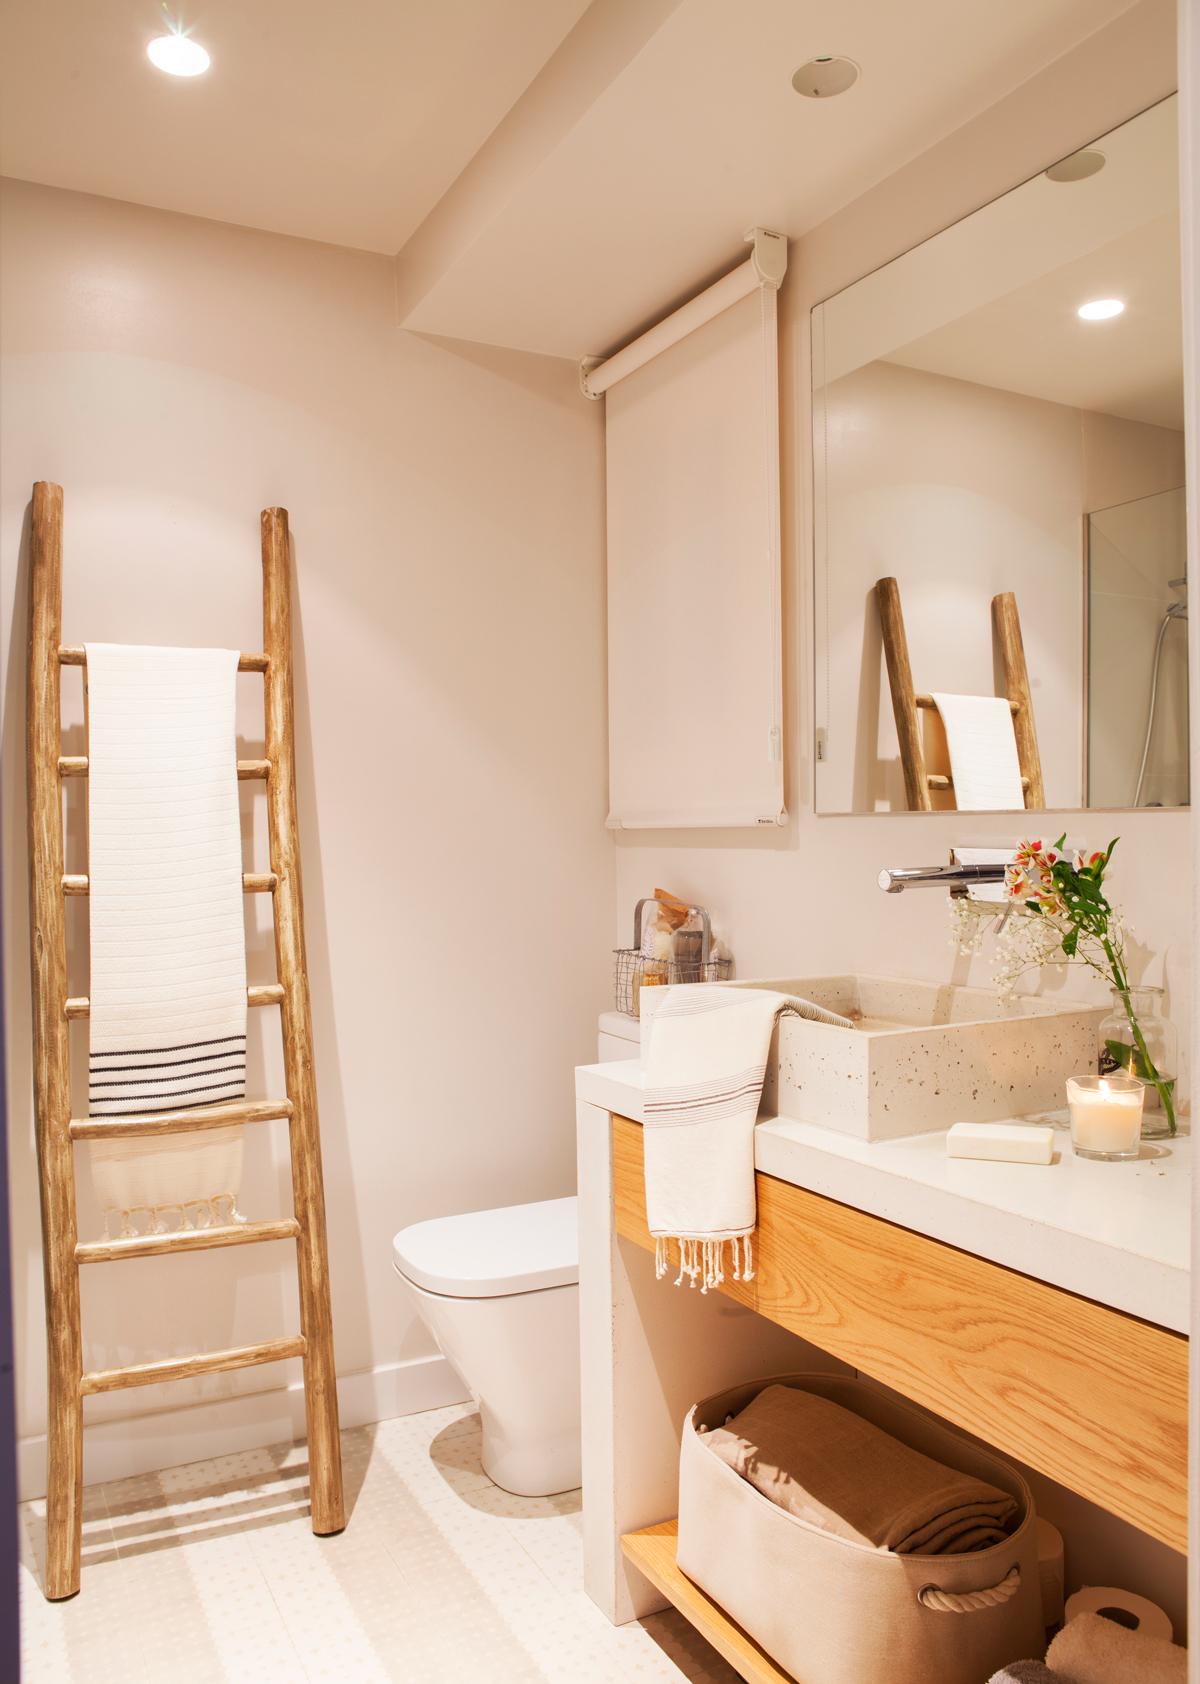 Muebles perfectos para ba os peque os for Banos bonitos y baratos